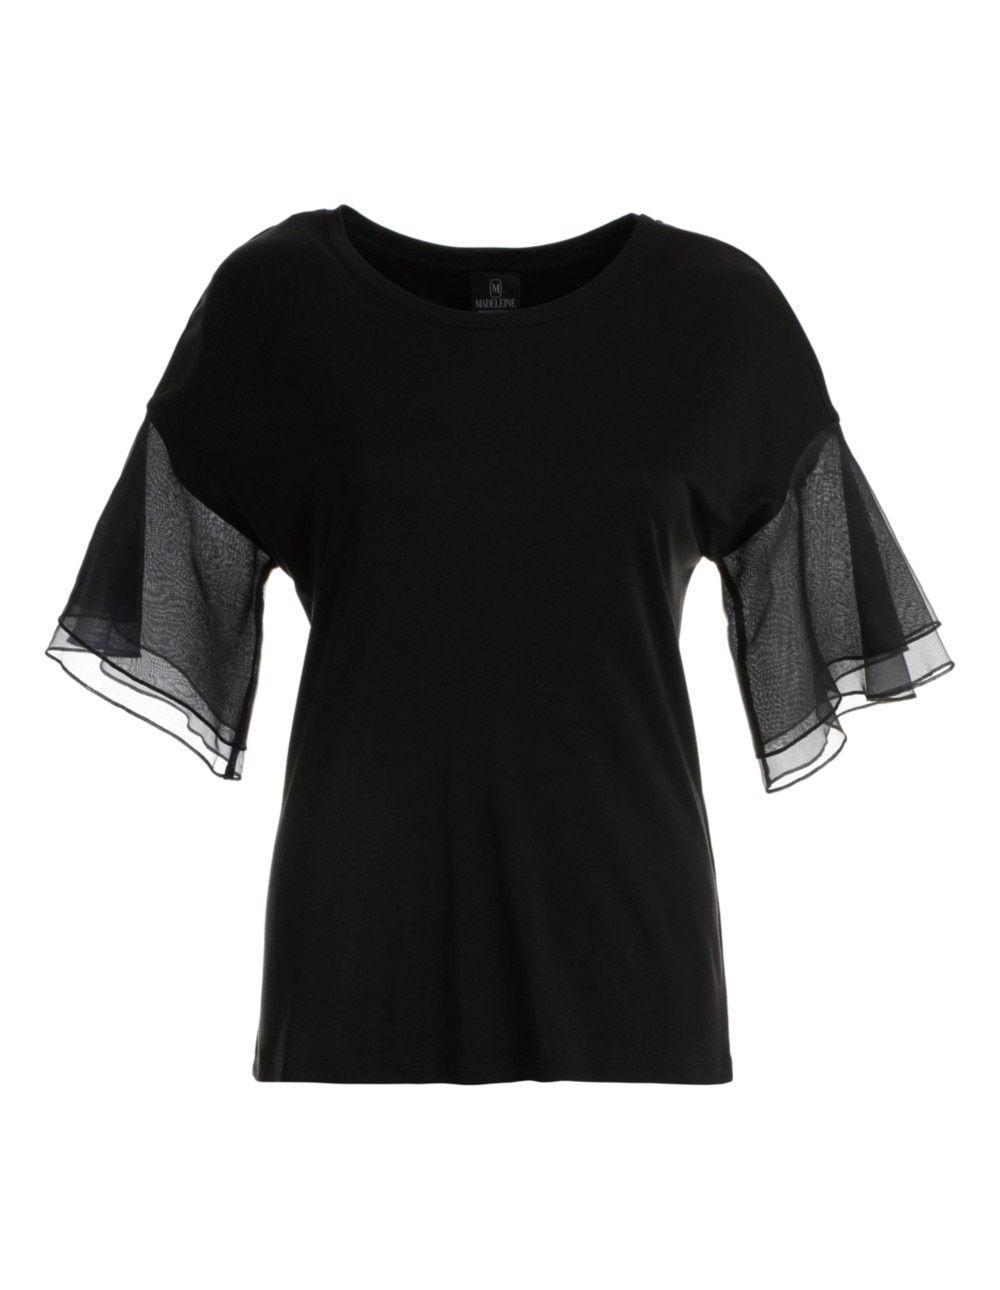 Abendmode  MADELEINE Mode  Shirts, Hemd, Outfit shoppen